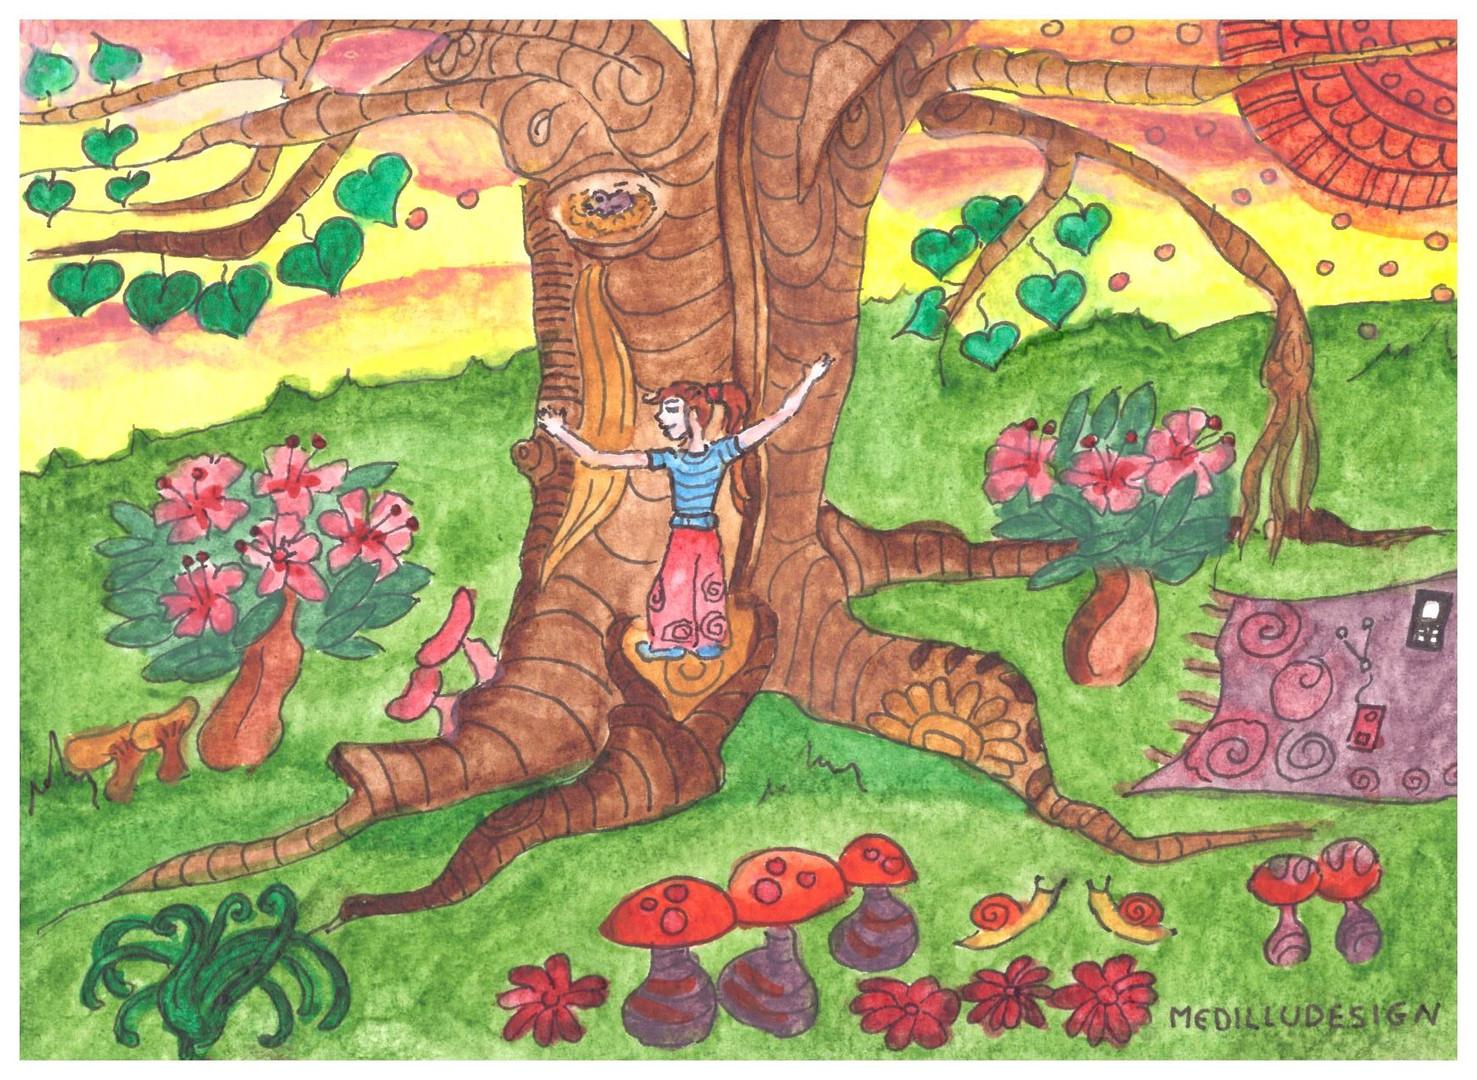 postcardhugatree2 001b 001.jpg